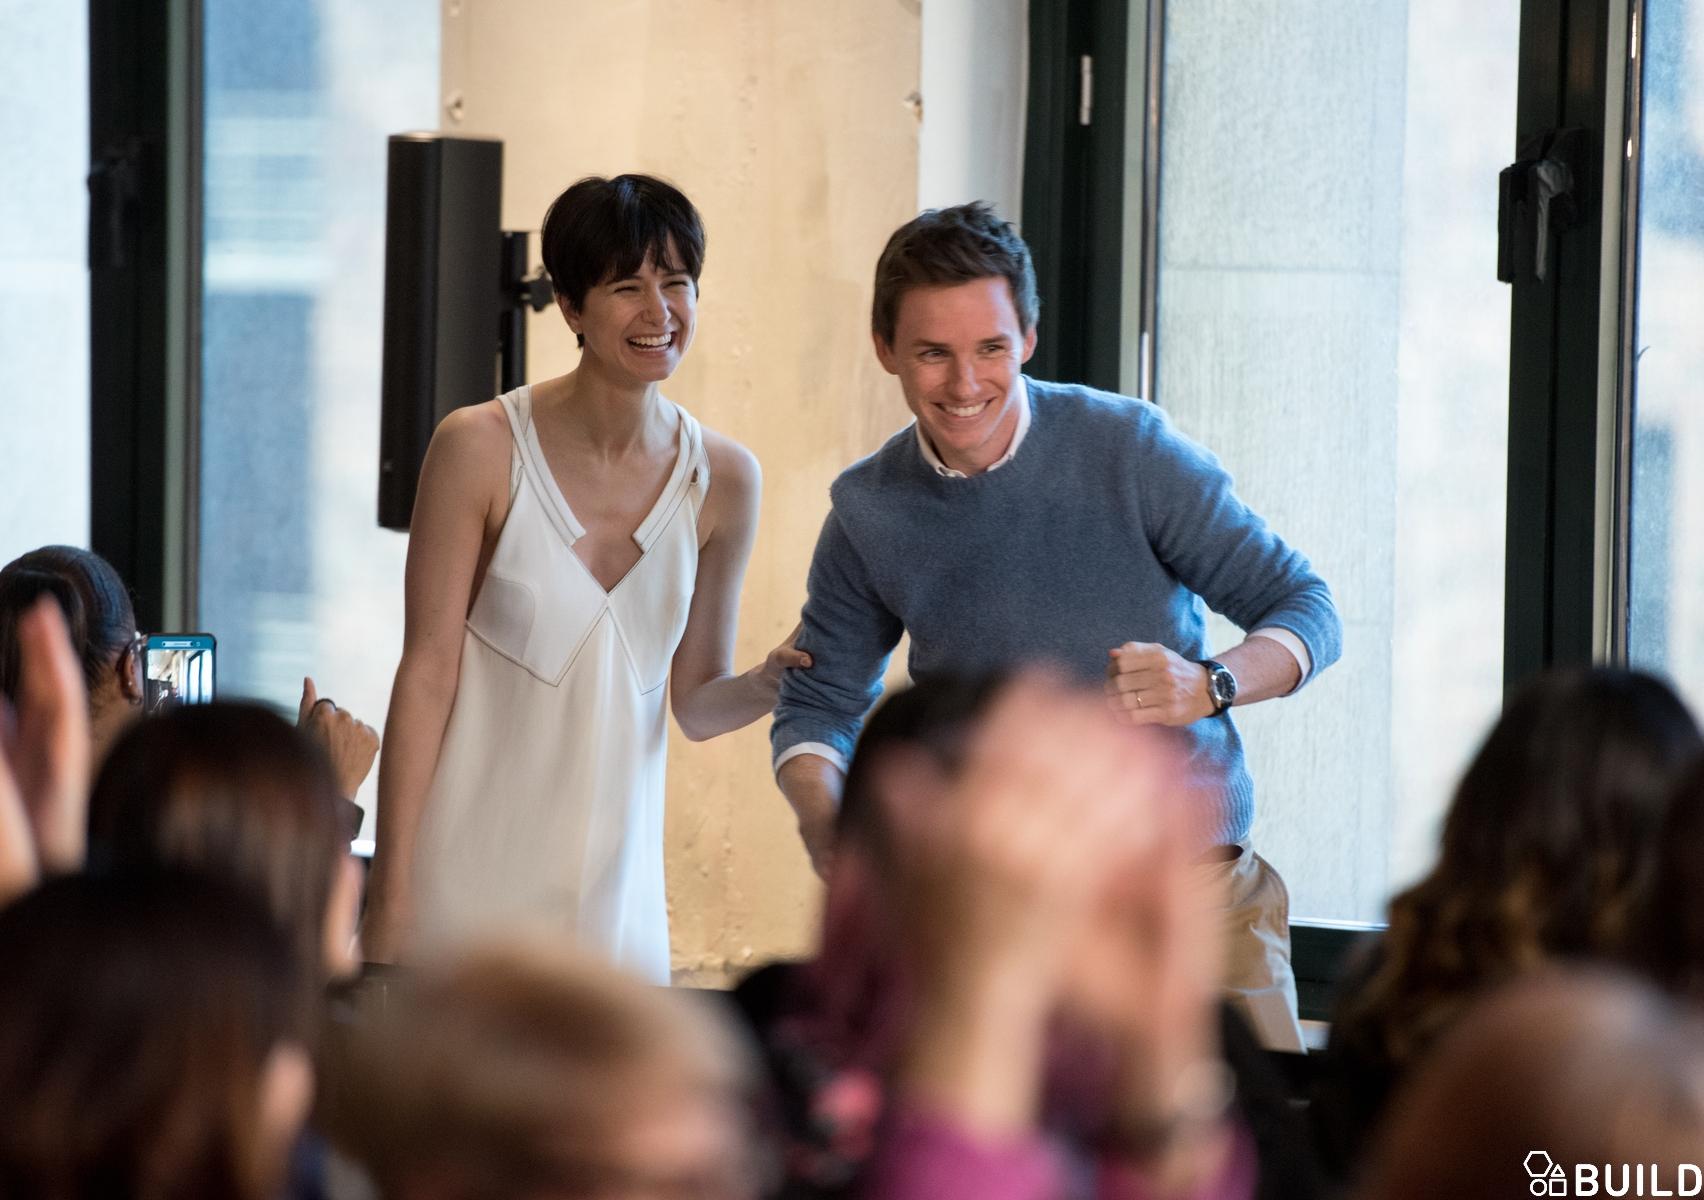 Eddie Redmayne, Katherine Waterston, Dan Fogler & Alison Sudol visits AOL Hq for Build on November 11, 2016 in New York. Photos by Noam Galai